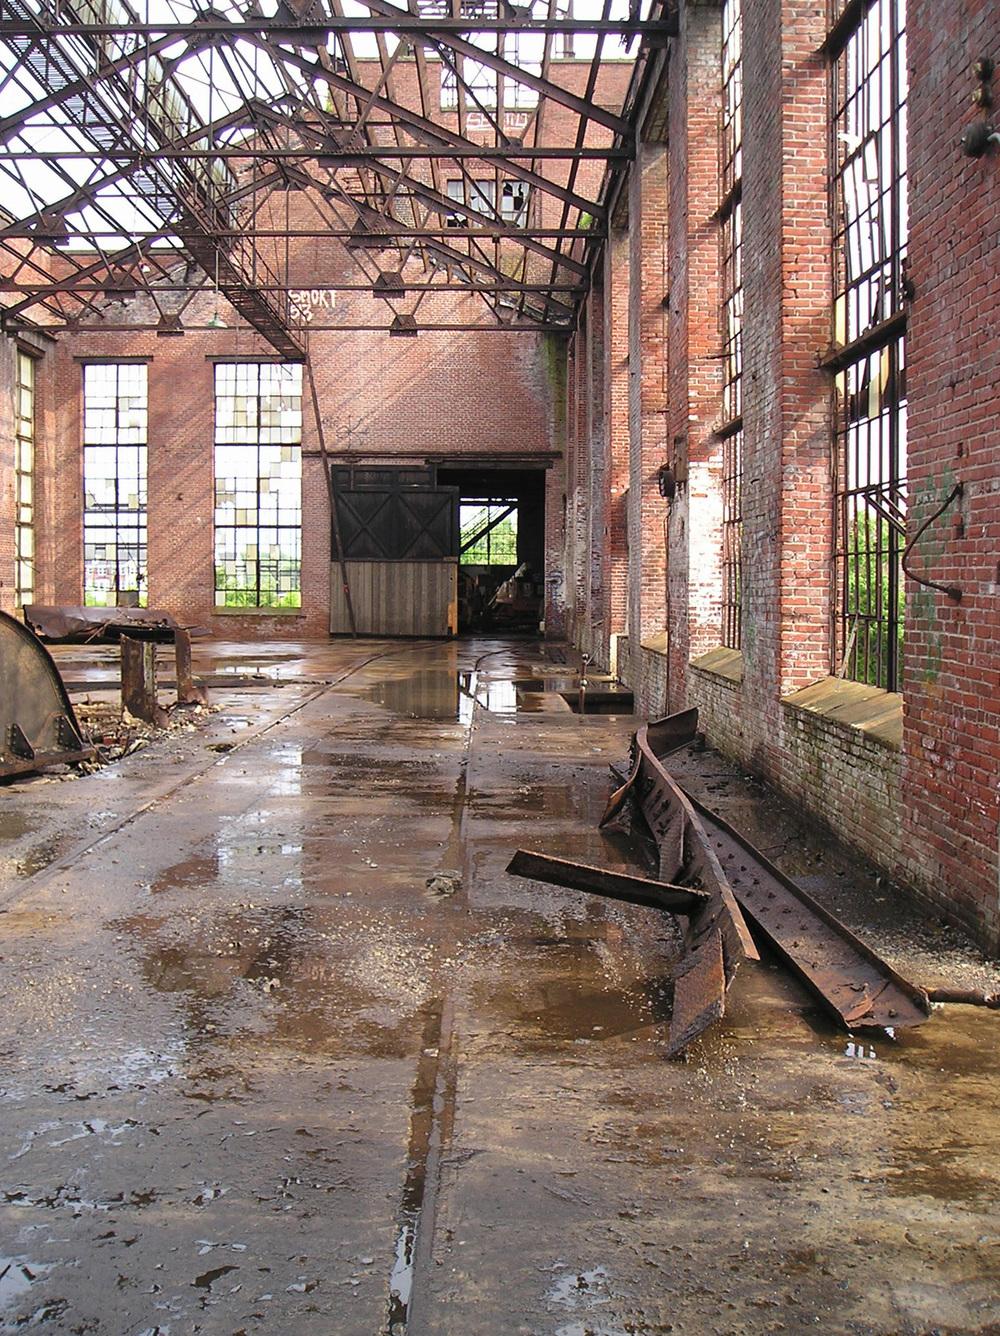 03 - Ambler Boiler House - Existing - DiD.jpg